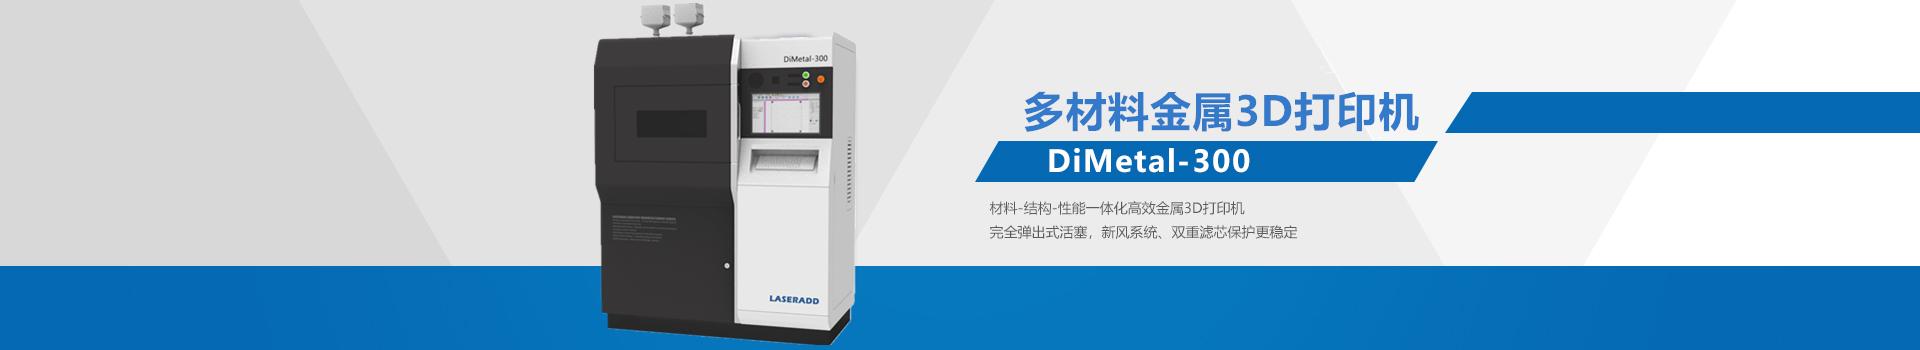 DiMetal-300 多材料金属3D打印机